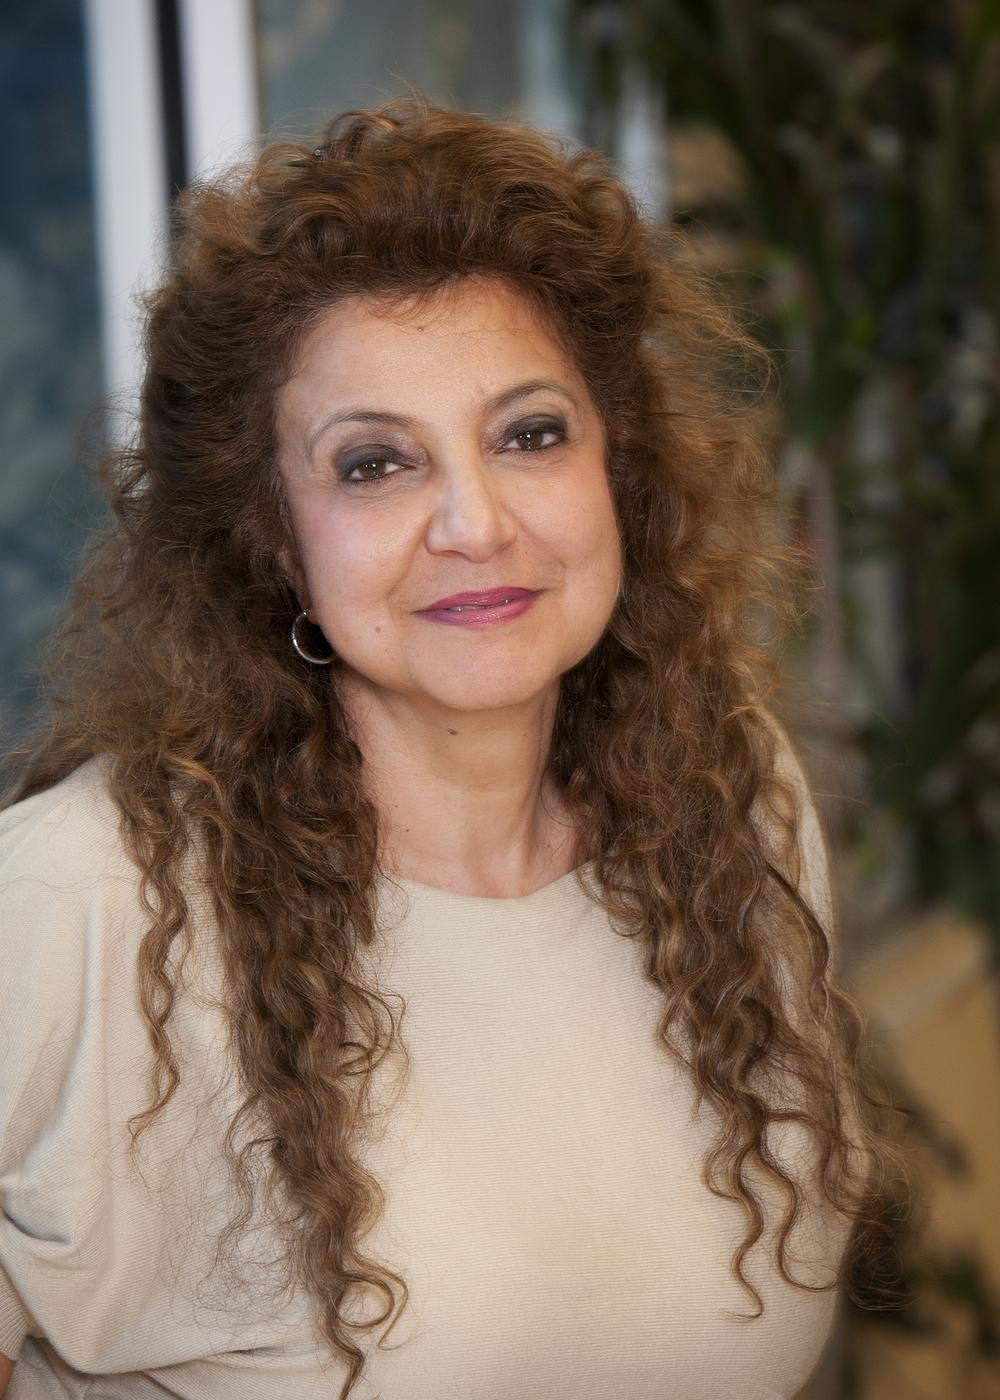 Dr. Angela Mailis, Founder